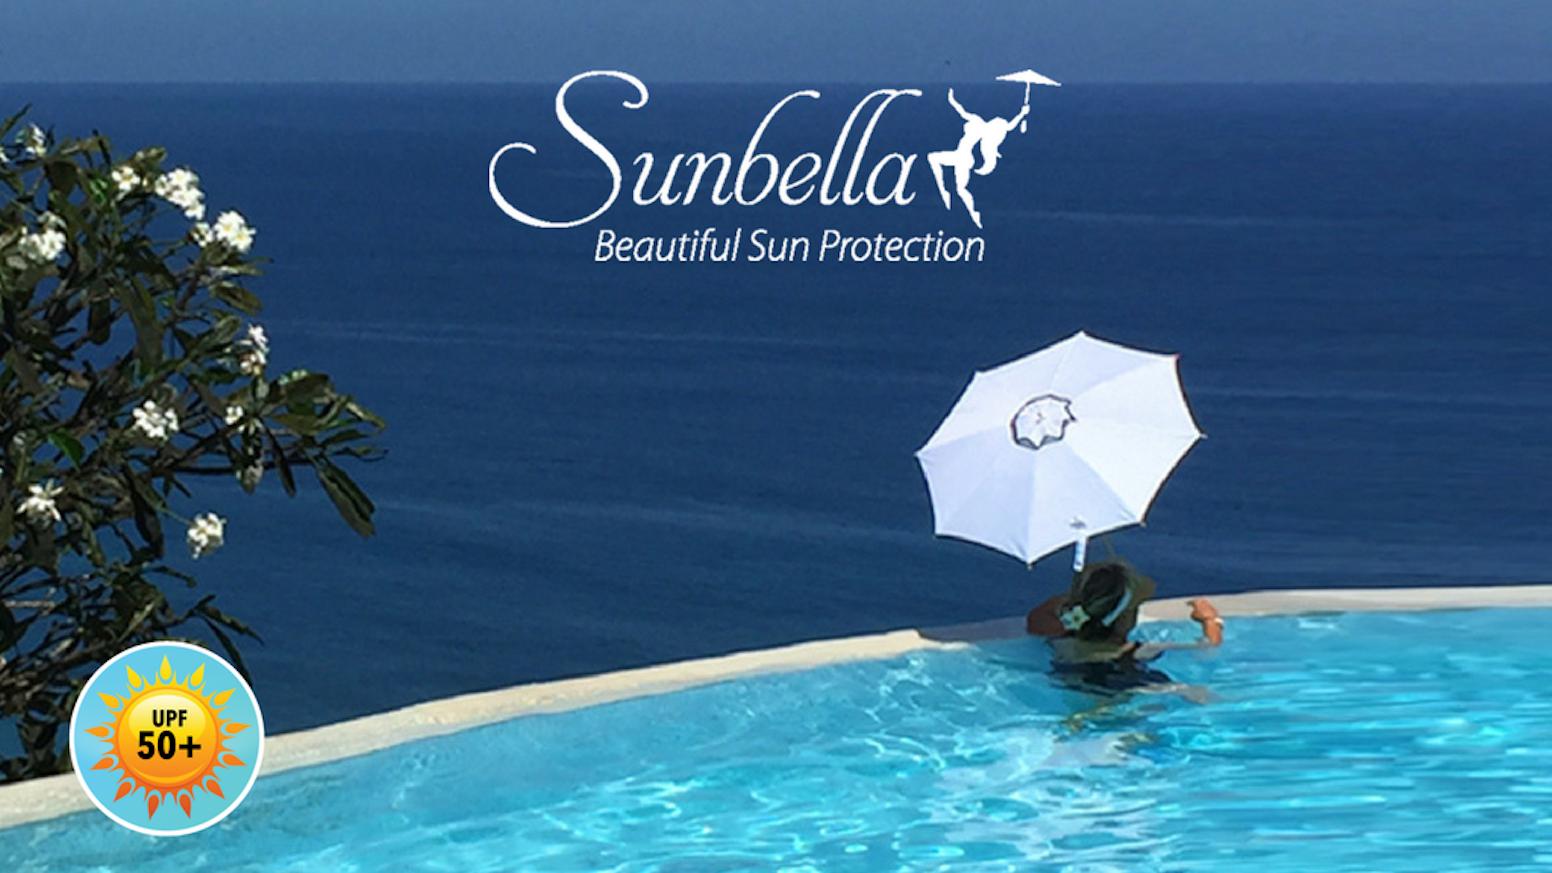 5a63131a8fd1 Sunbella's Folding UV Sun Umbrella | UPF50+ by Jillian Intini ...